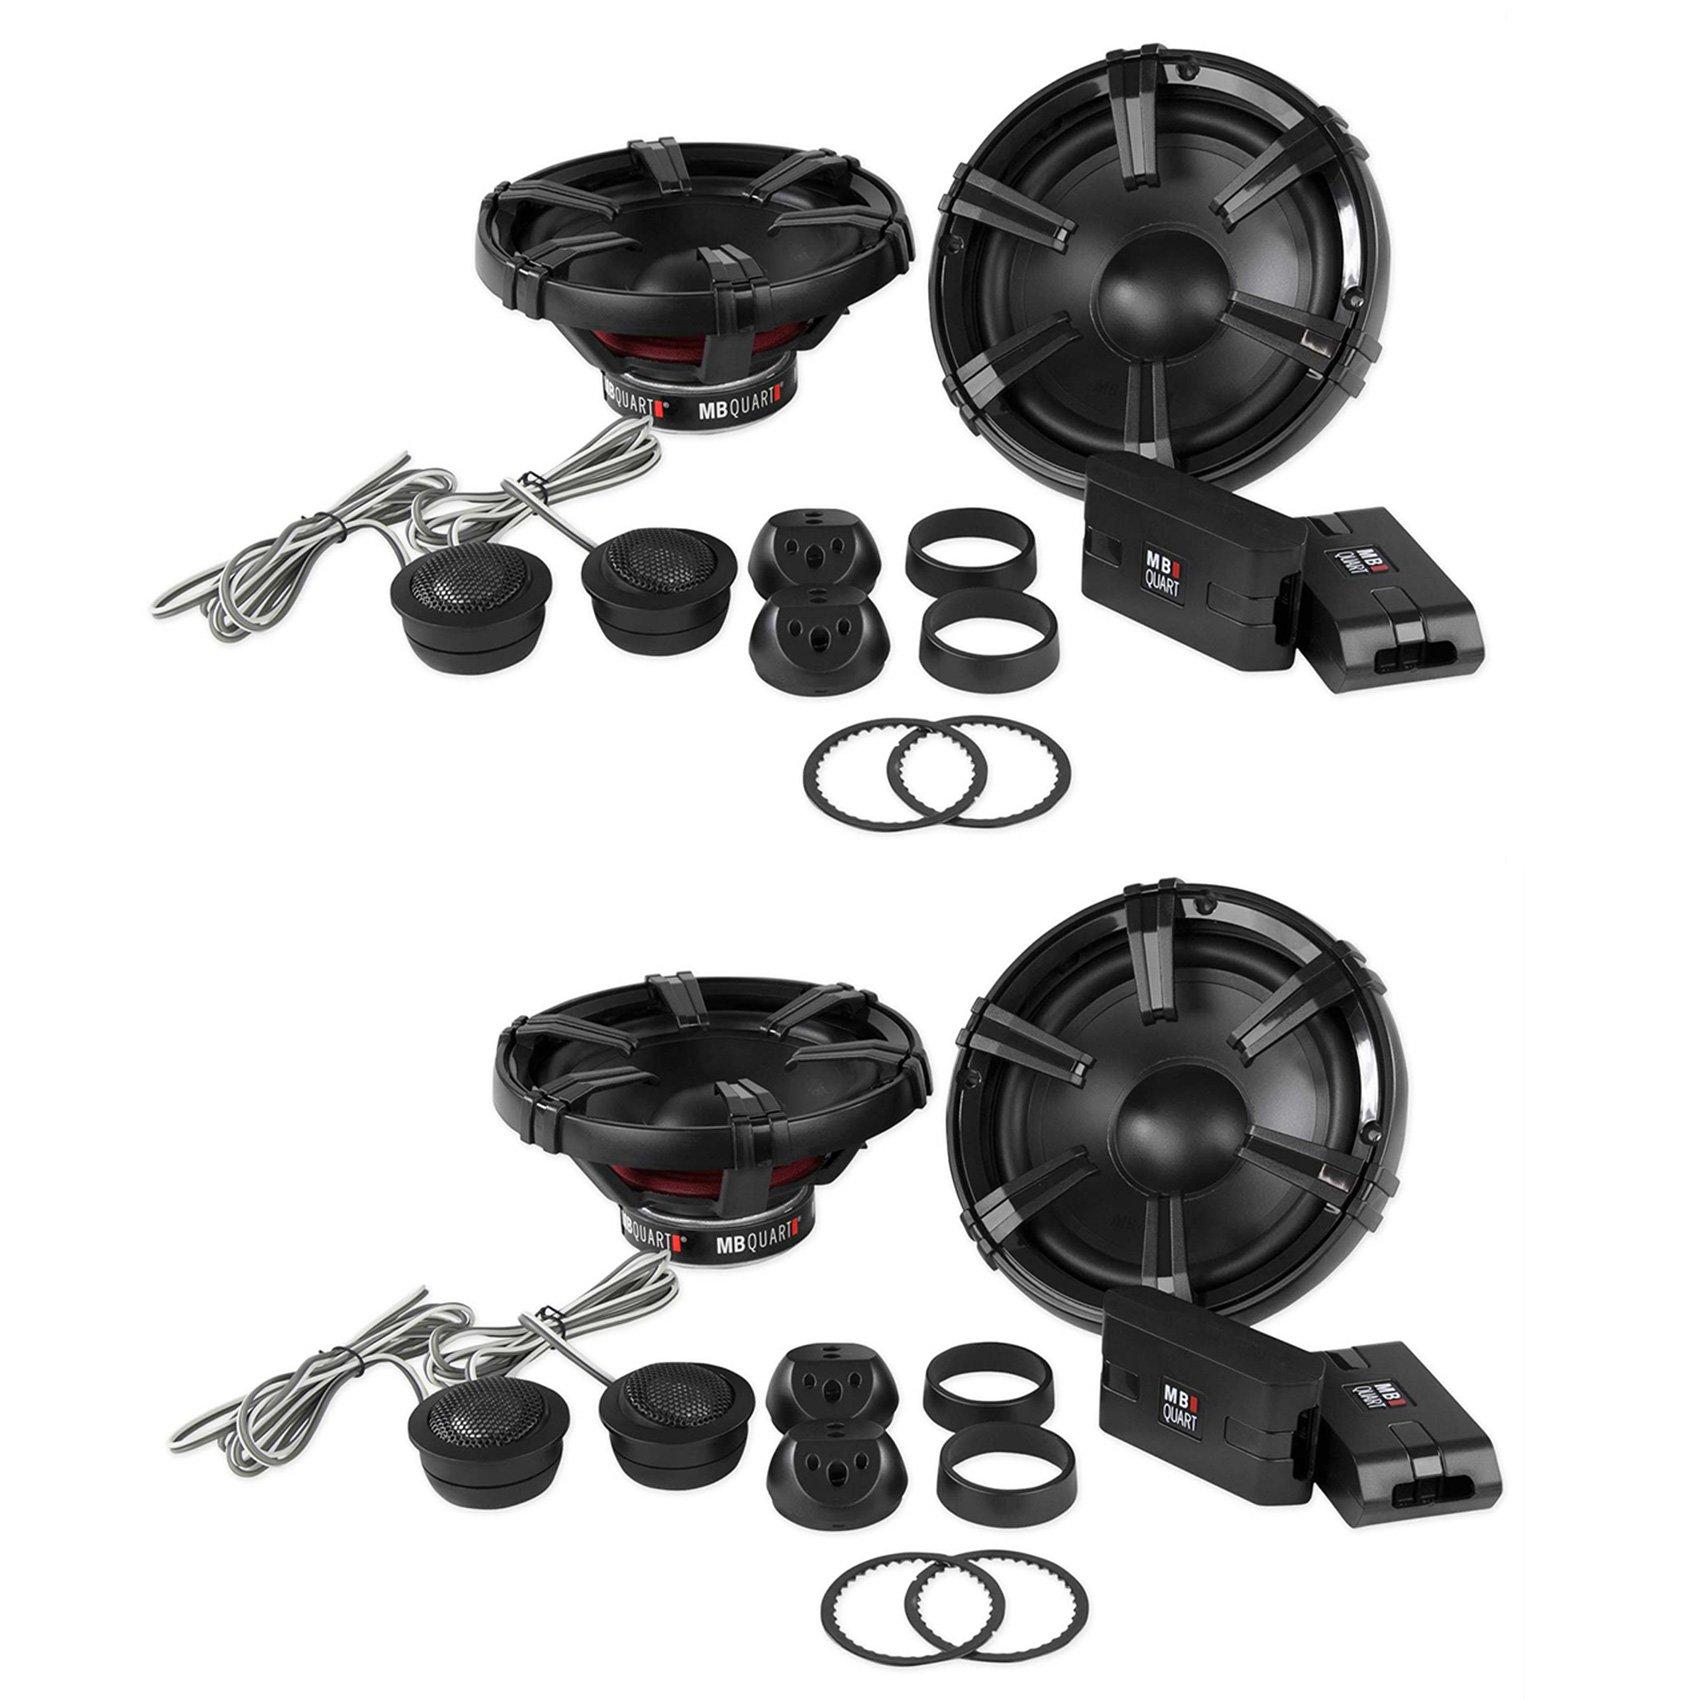 4 MB Quart 6.5'' 90 Watt Component Speakers Speaker System Set Four| DC1-216